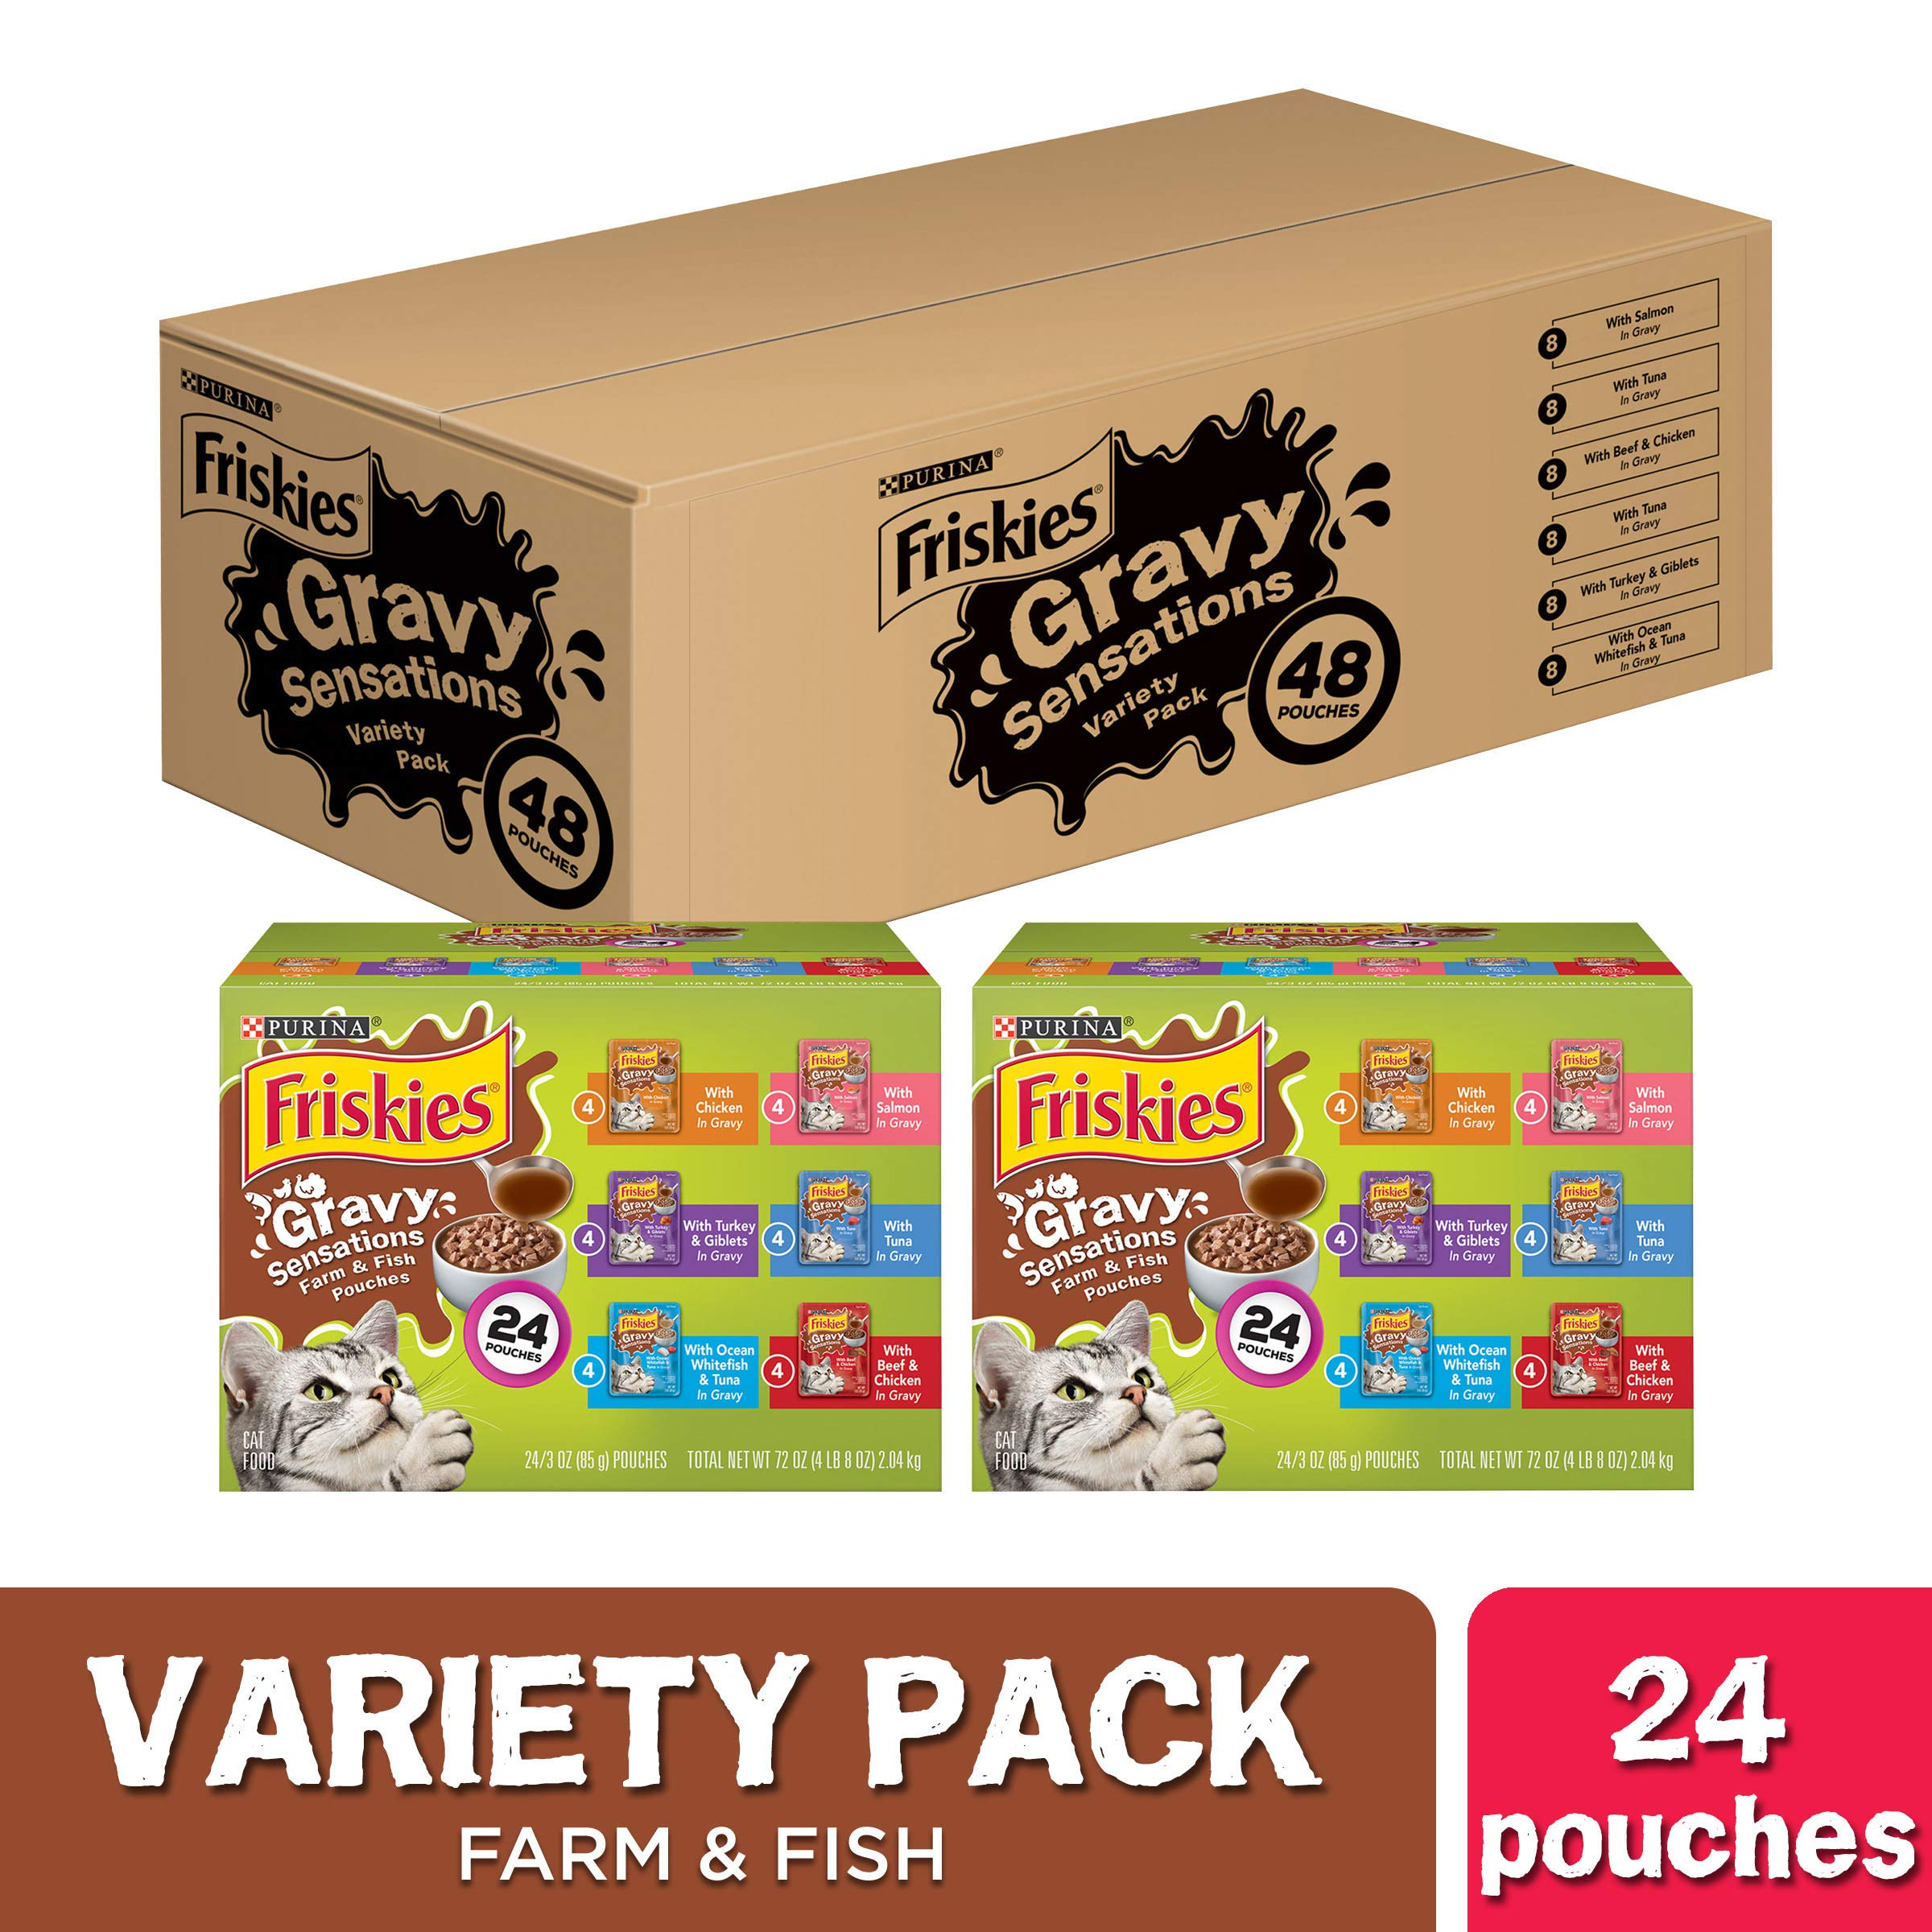 Purina Friskies Gravy Wet Cat Food Variety Pack, Gravy Sensations Farm & Fish Pouches - (2 Packs of 24) 3 oz. Pouches by Purina Friskies